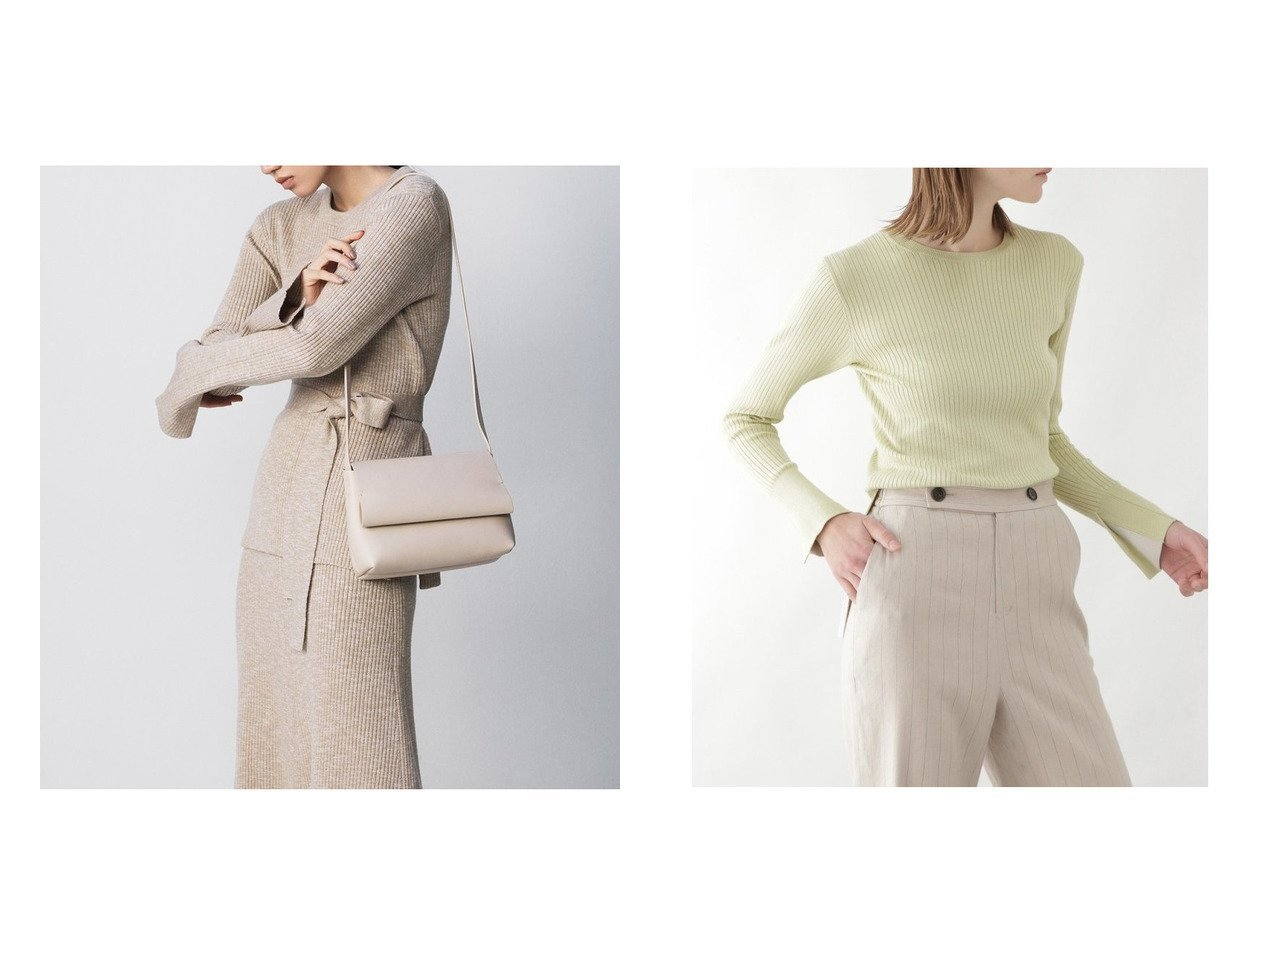 【BOSCH/ボッシュ】のシルクストレッチリブニット&【Mila Owen/ミラオーウェン】のリボン付クルーネックリブニット トップス・カットソーのおすすめ!人気、トレンド・レディースファッションの通販  おすすめで人気の流行・トレンド、ファッションの通販商品 メンズファッション・キッズファッション・インテリア・家具・レディースファッション・服の通販 founy(ファニー) https://founy.com/ ファッション Fashion レディースファッション WOMEN トップス Tops Tshirt ニット Knit Tops リブニット リボン 再入荷 Restock/Back in Stock/Re Arrival |ID:crp329100000010556